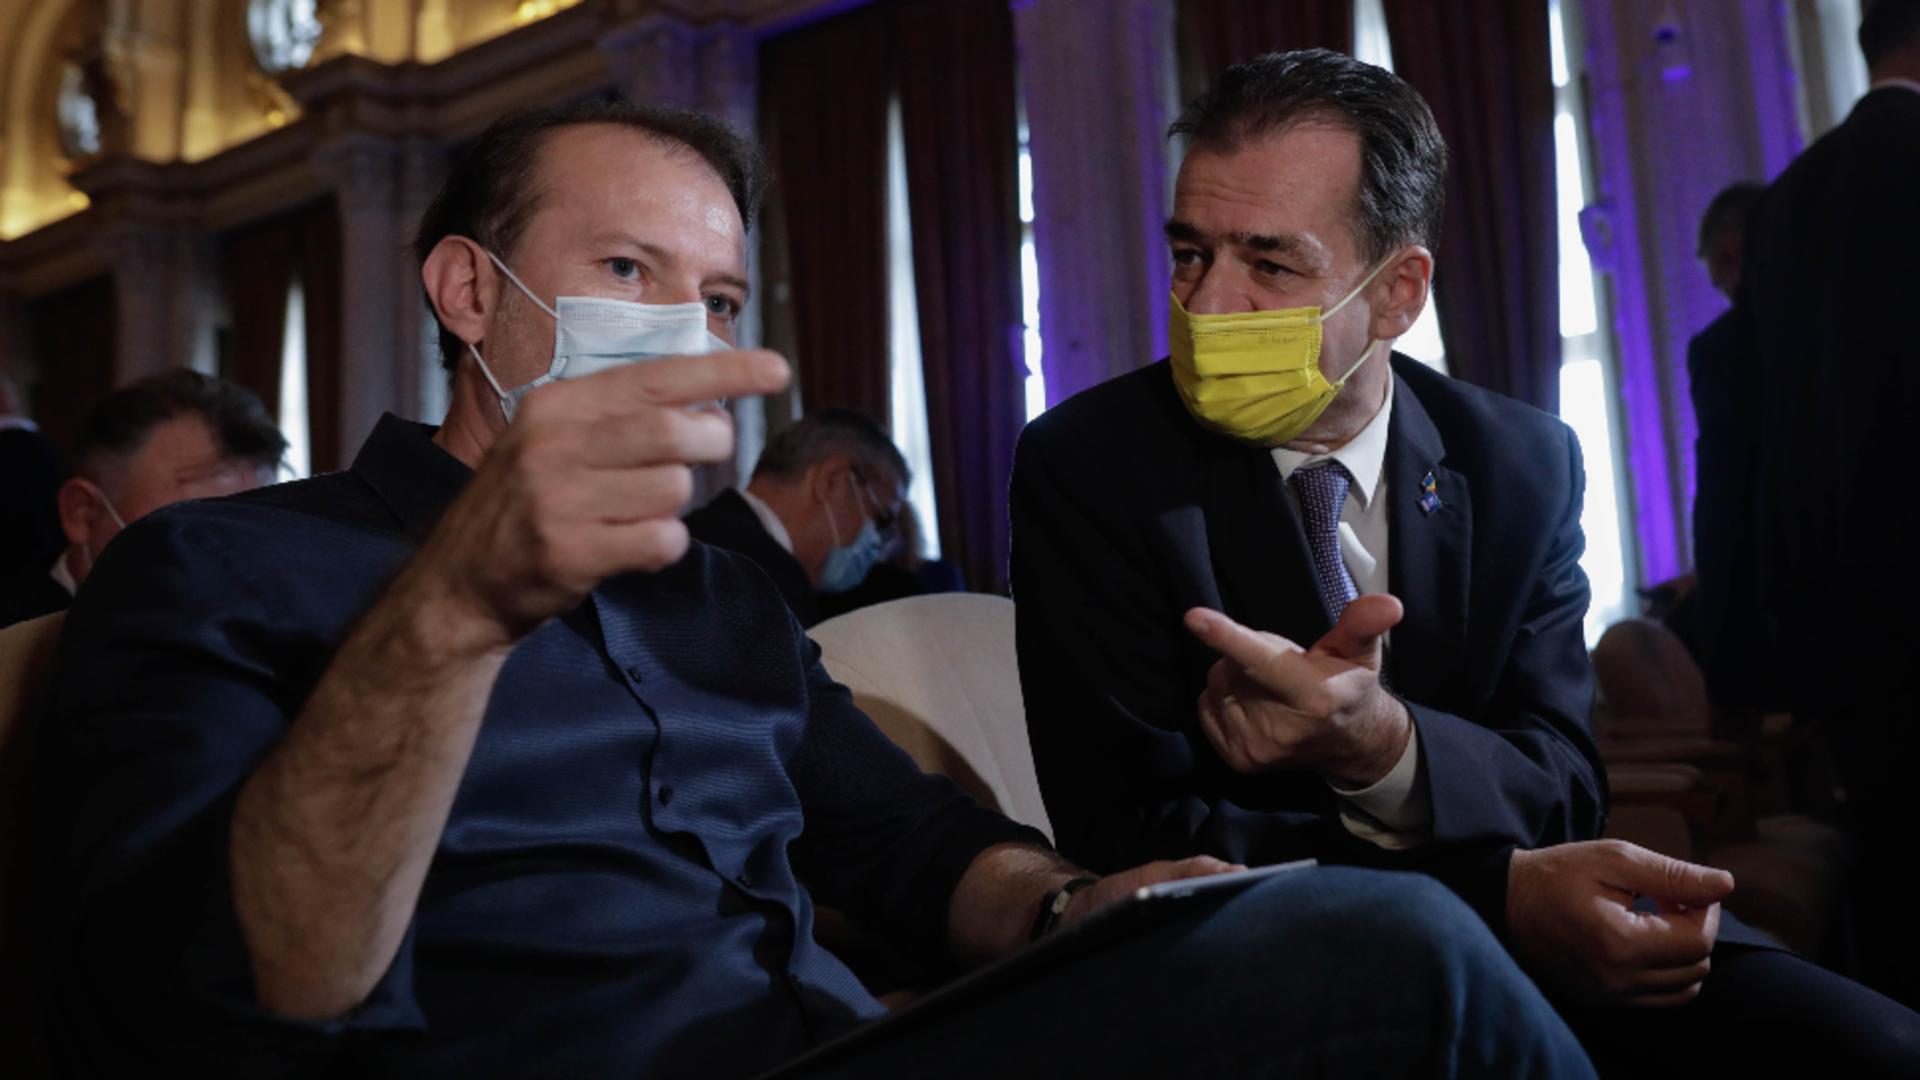 Florin Cîțu și Ludovic Orban. Foto: Inquam  / George Călin